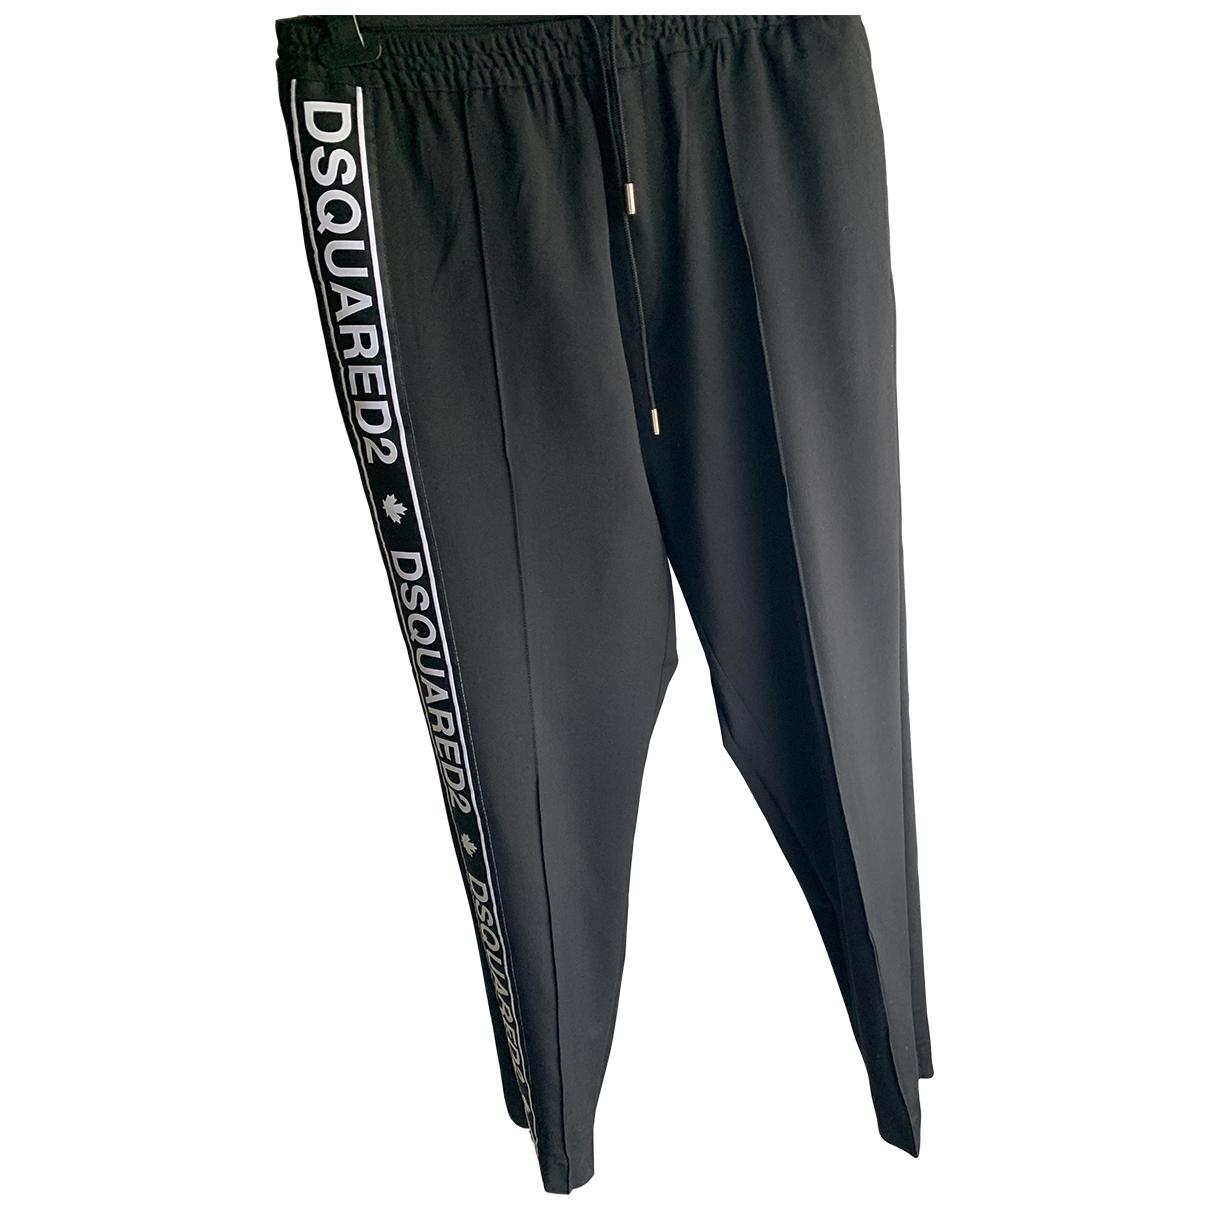 Dsquared2 \N Black Trousers for Men M International